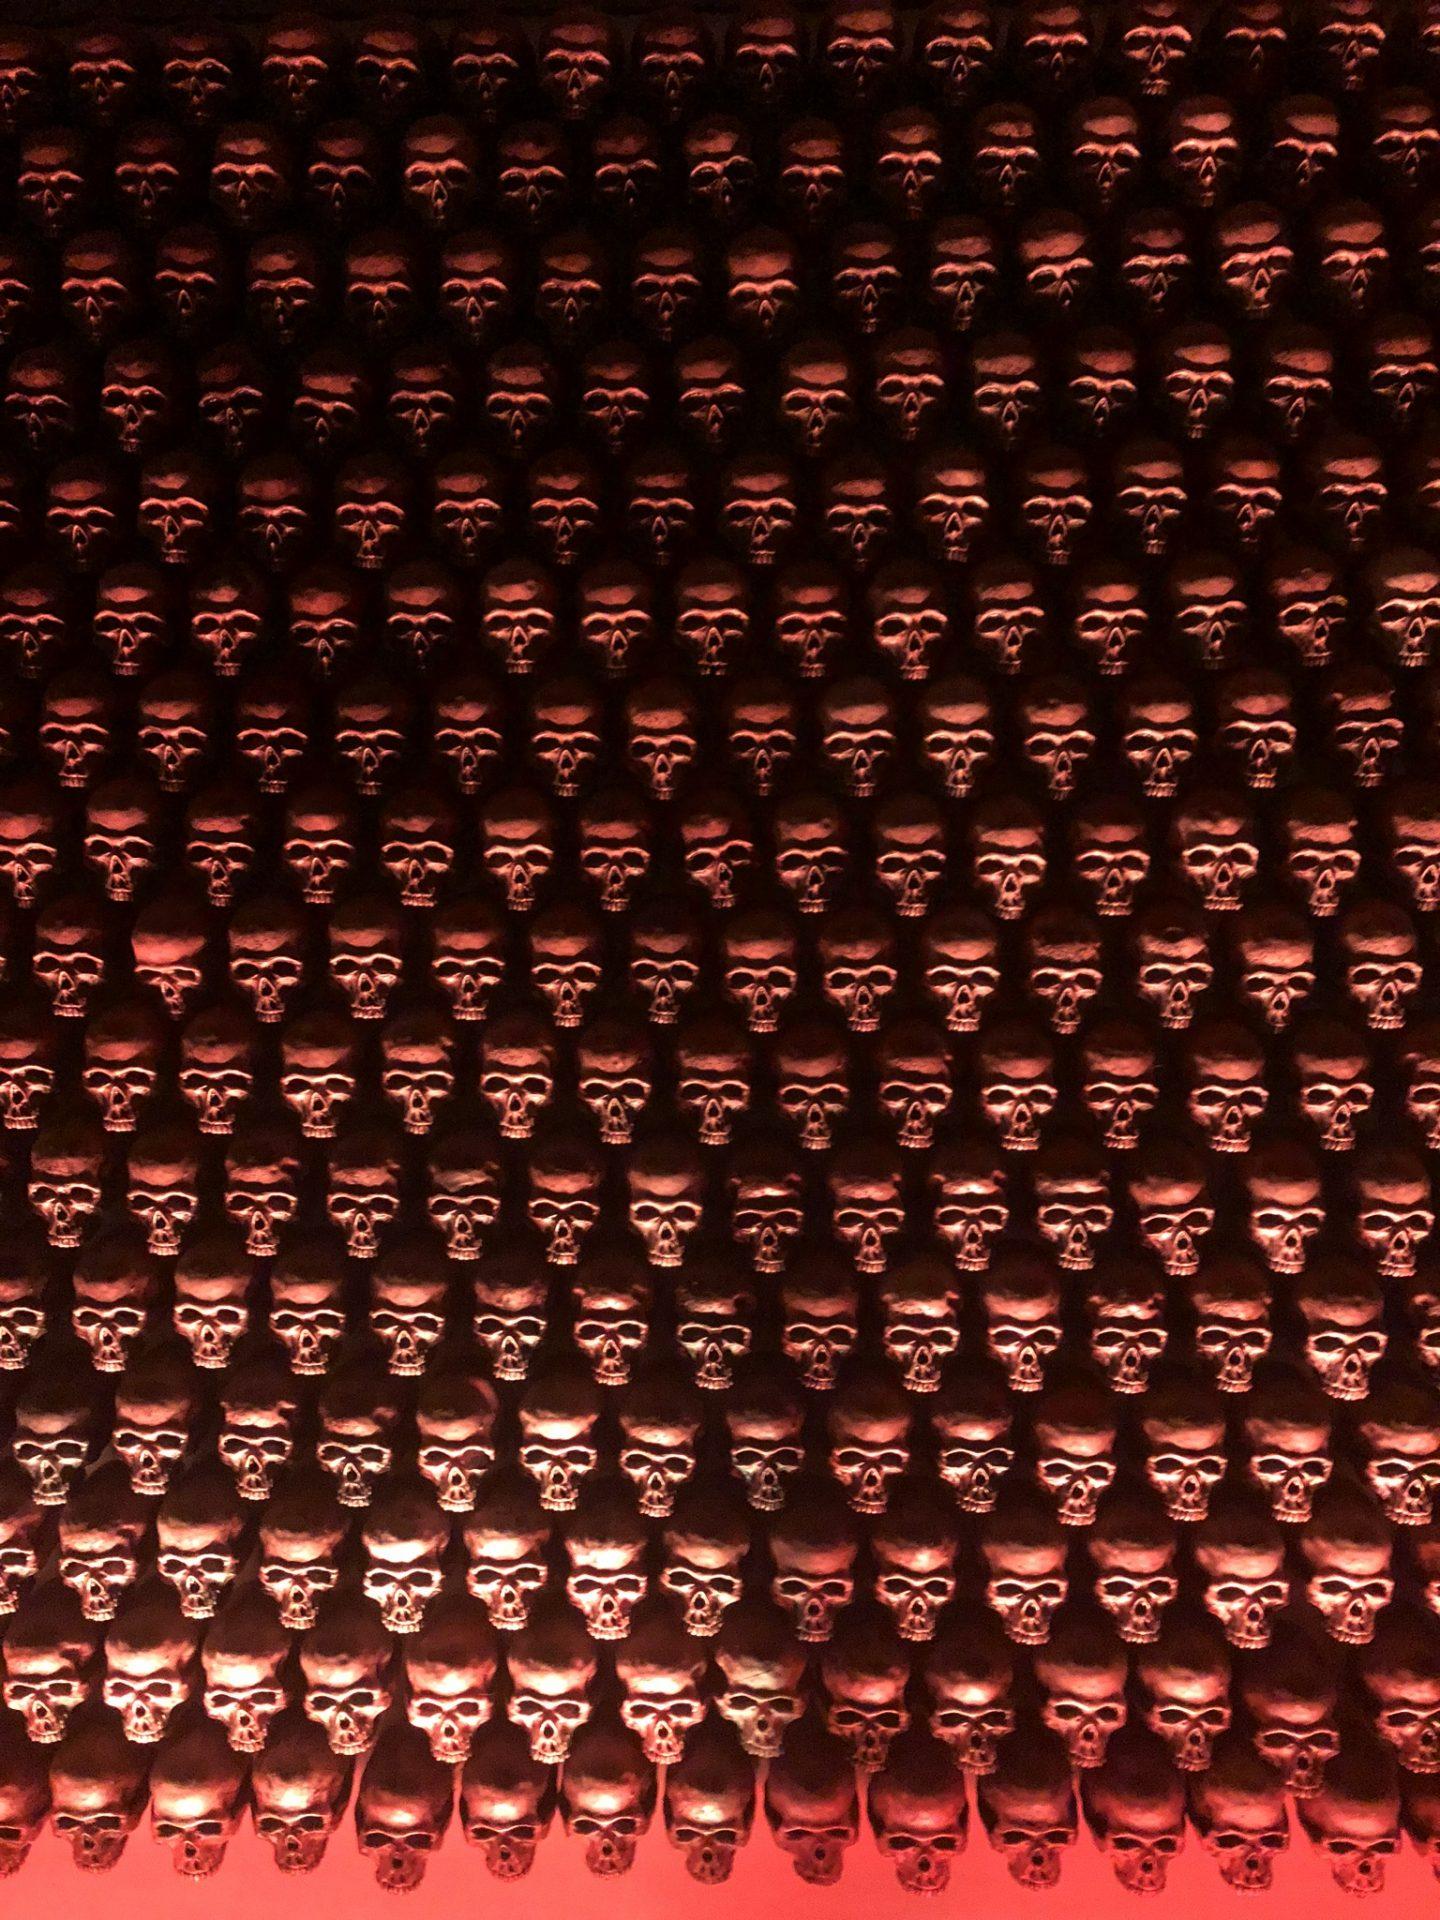 Skulls at GinGin, Roma